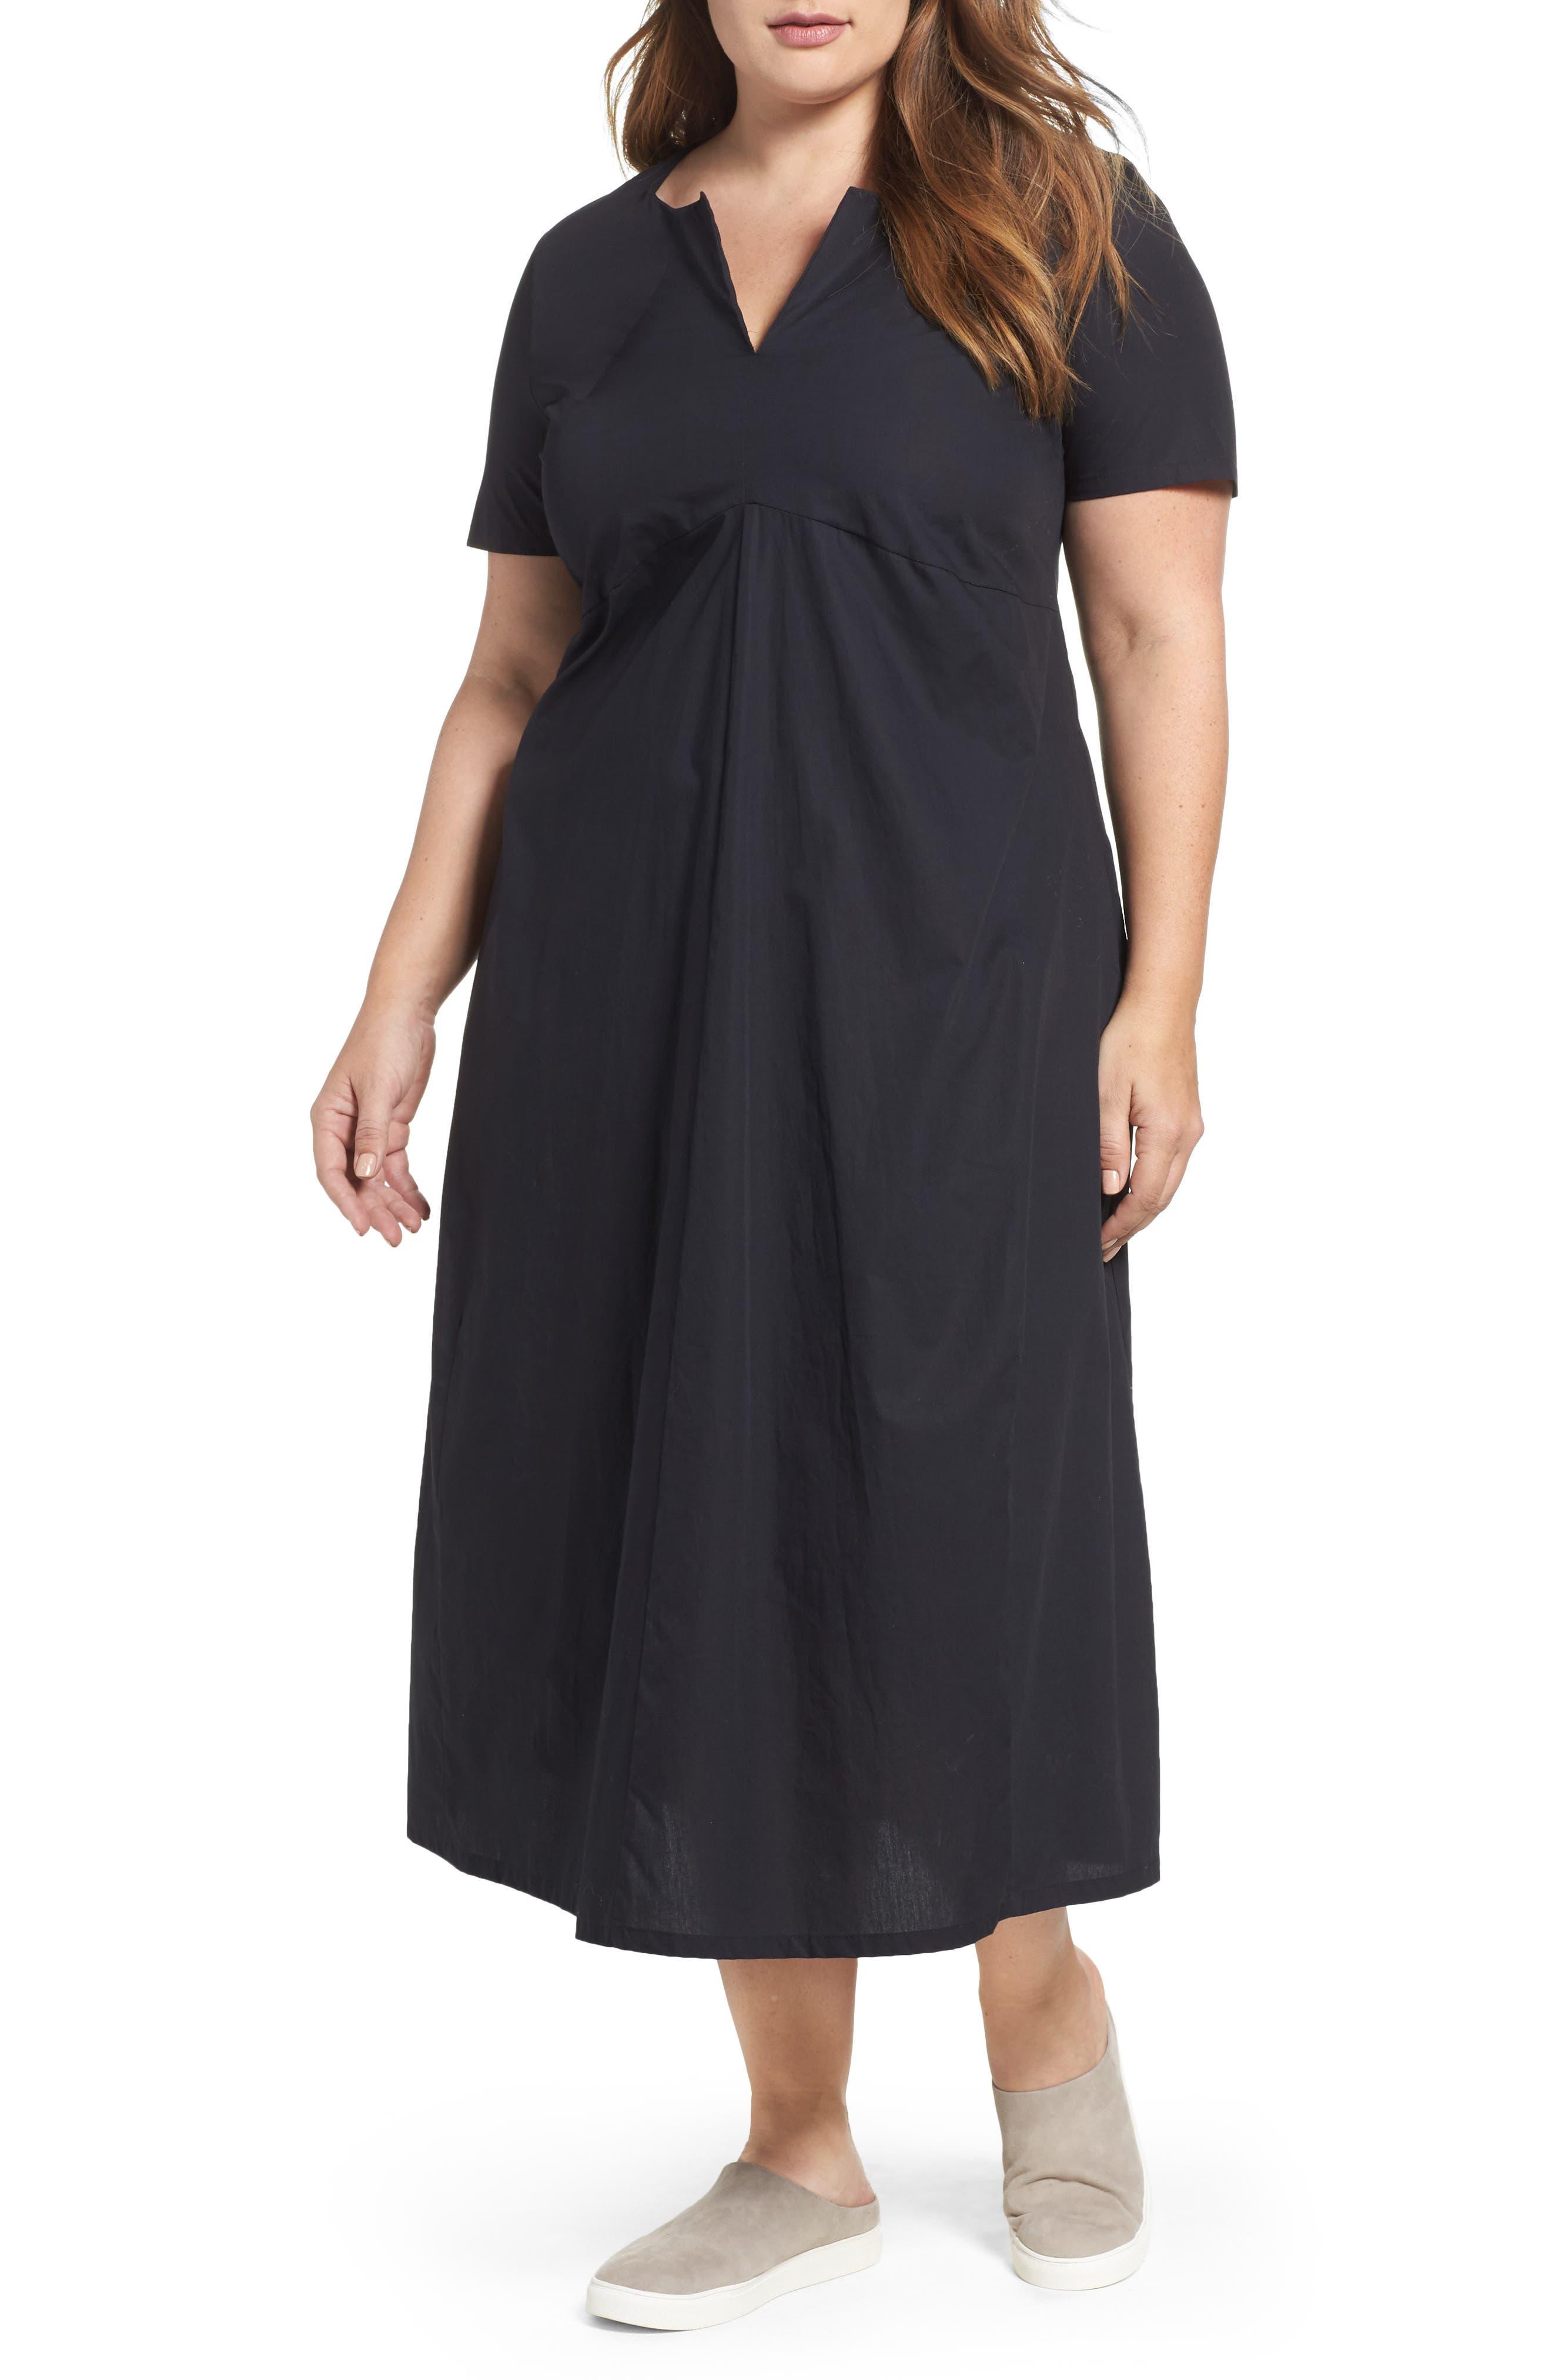 Duetto Midi Dress,                             Main thumbnail 1, color,                             001